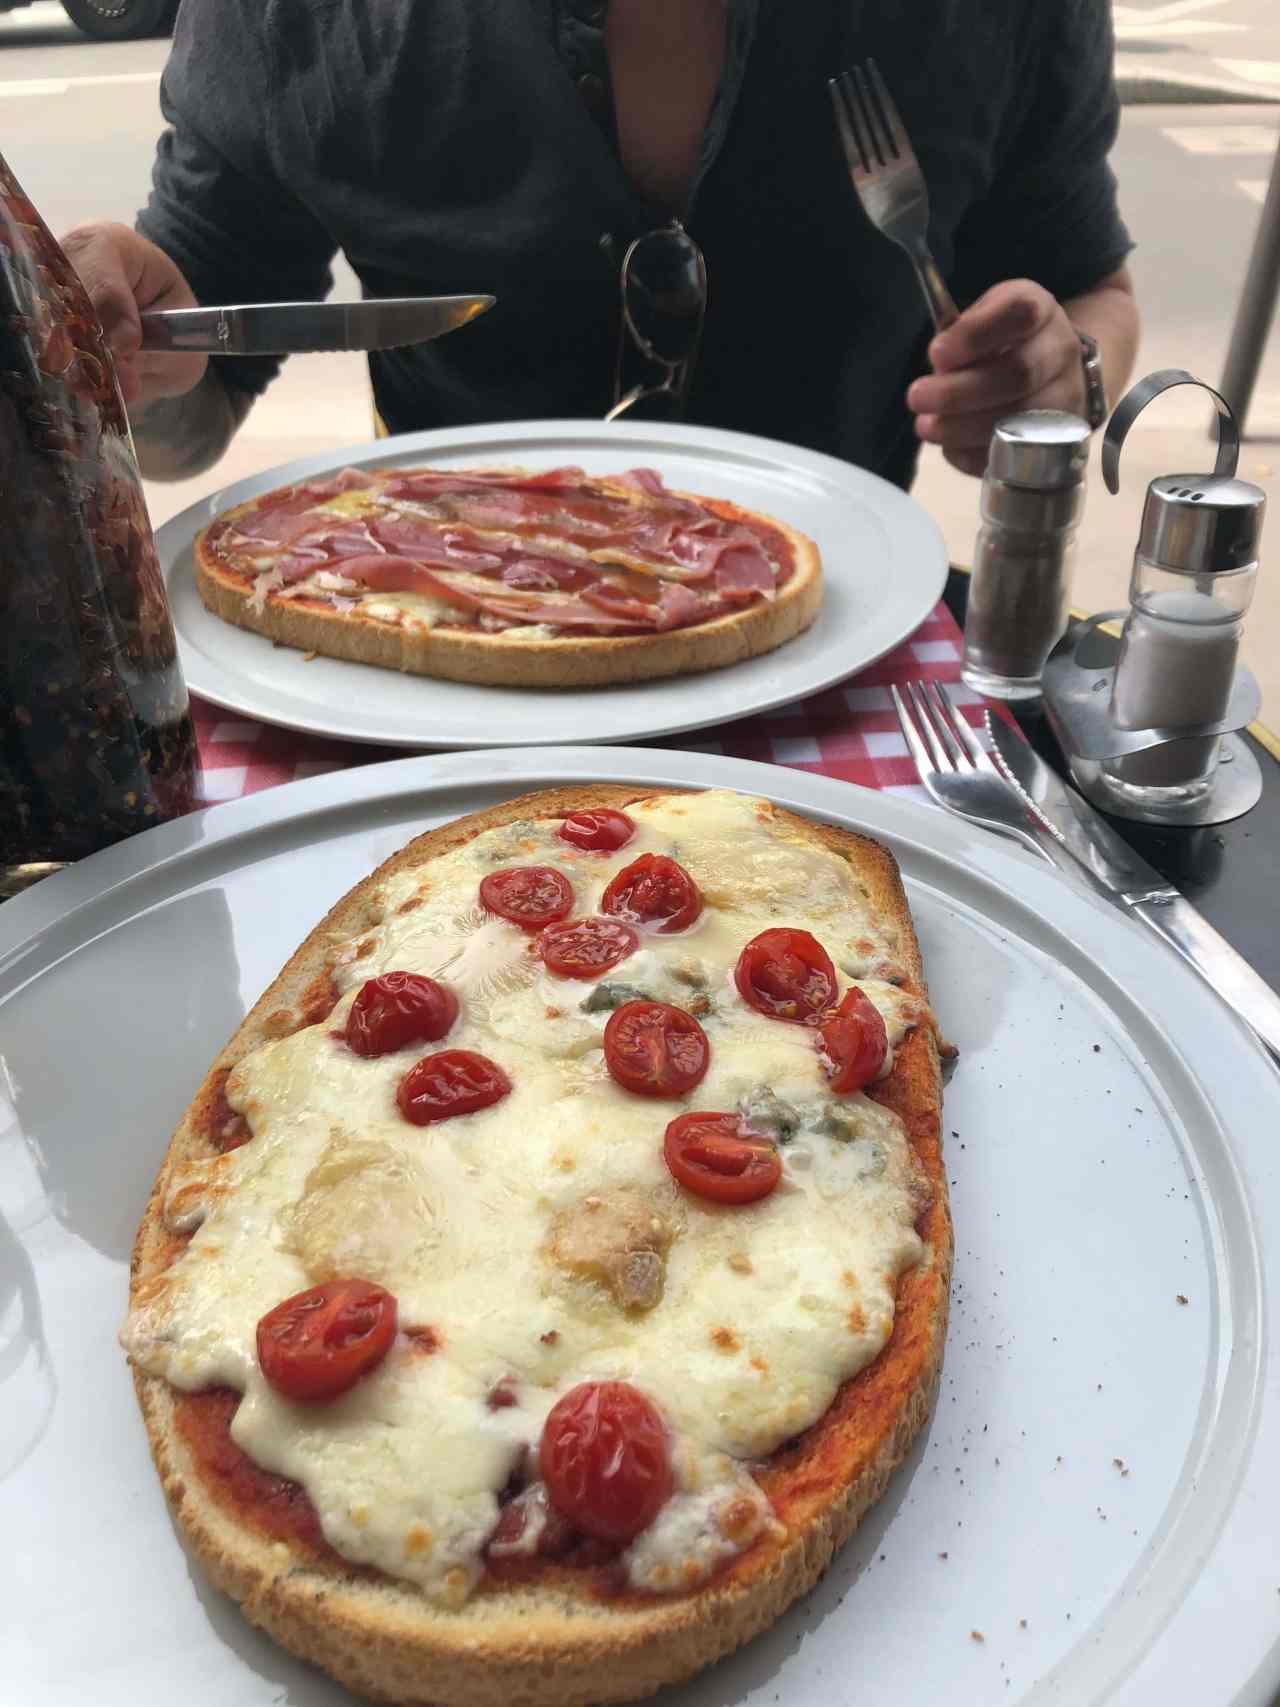 Lunch near the Sacre Coeur